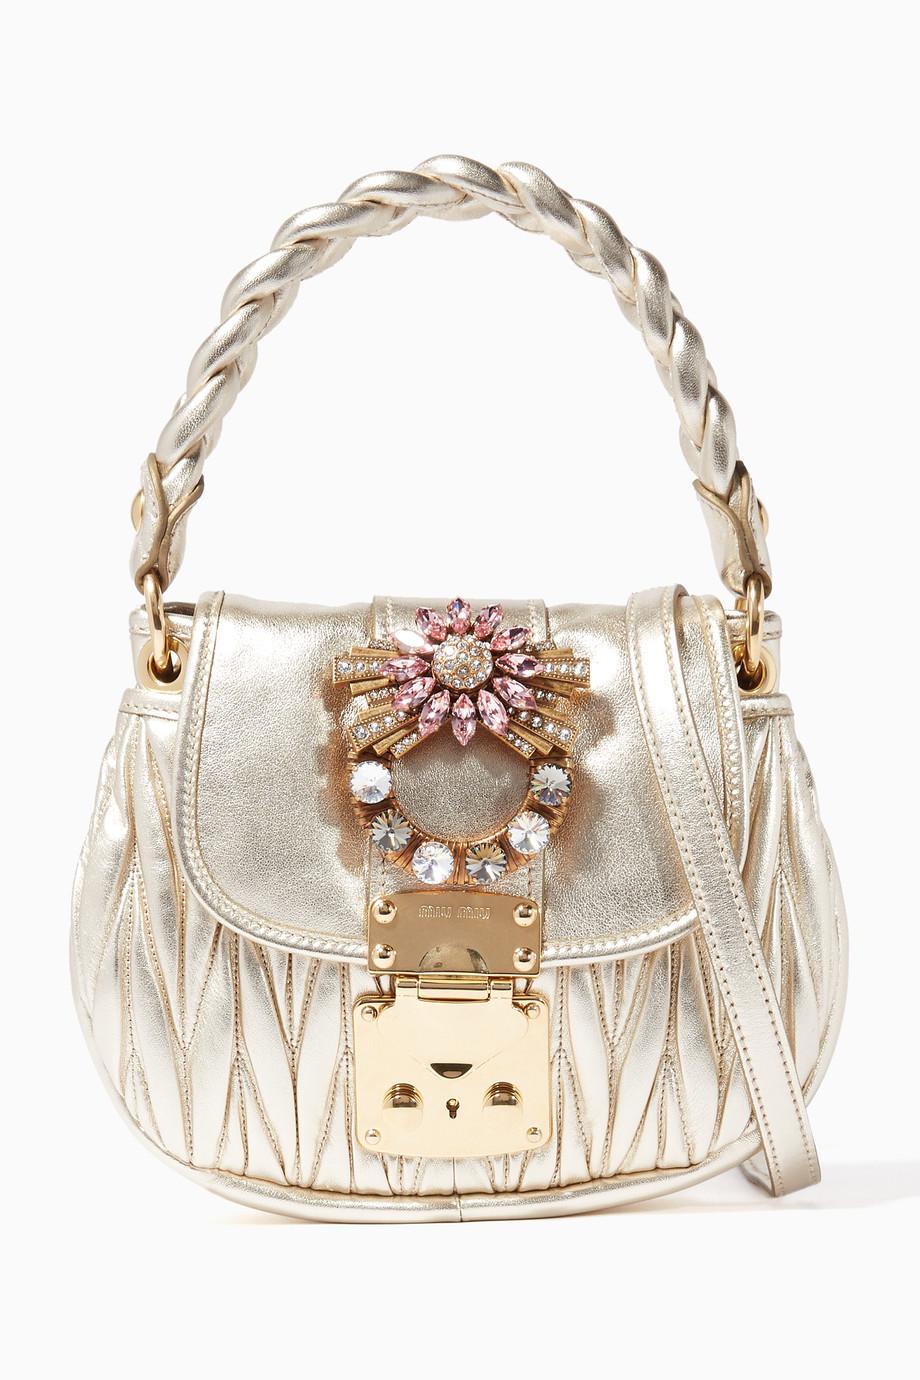 c44bc13828eb Shop Miu Miu Gold Gold Crystal-Embellished Matelassé Leather ...